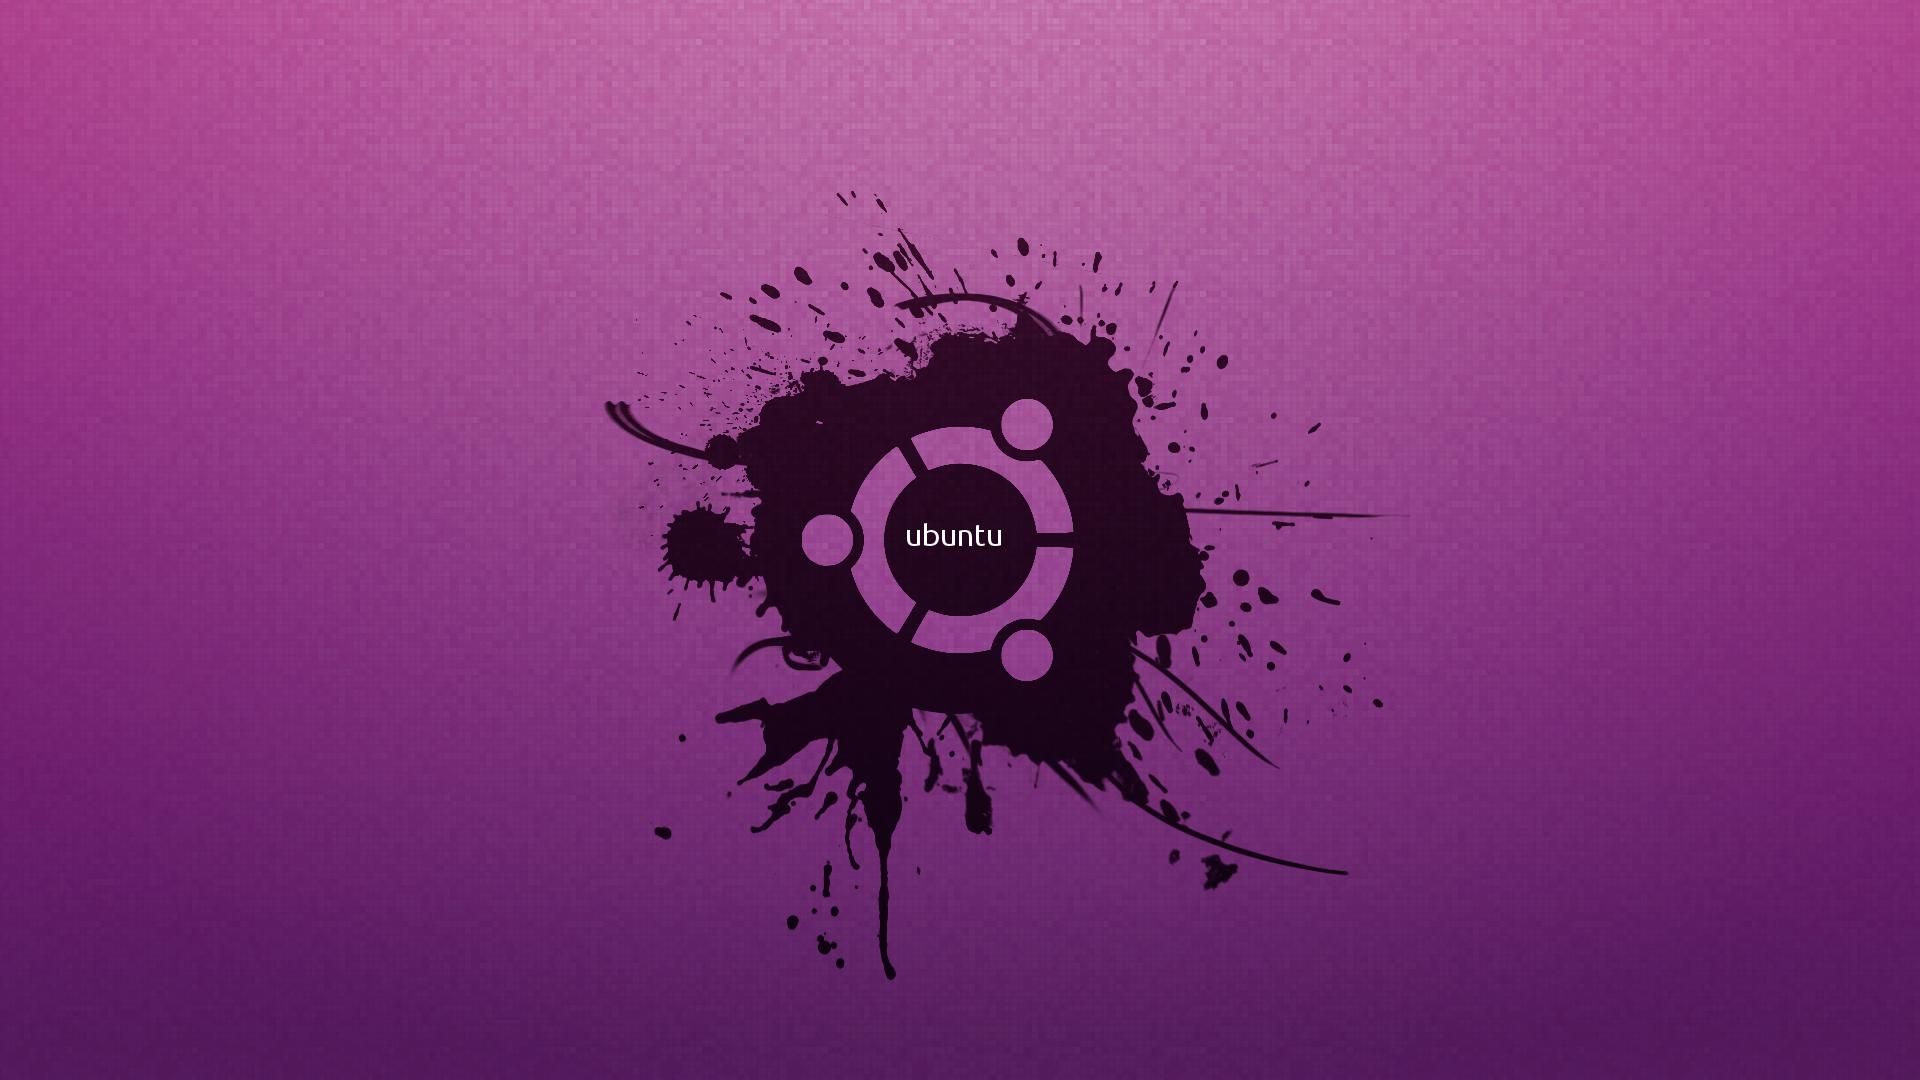 46 Ubuntu Wallpapers For Desktop and Laptops 1920x1080